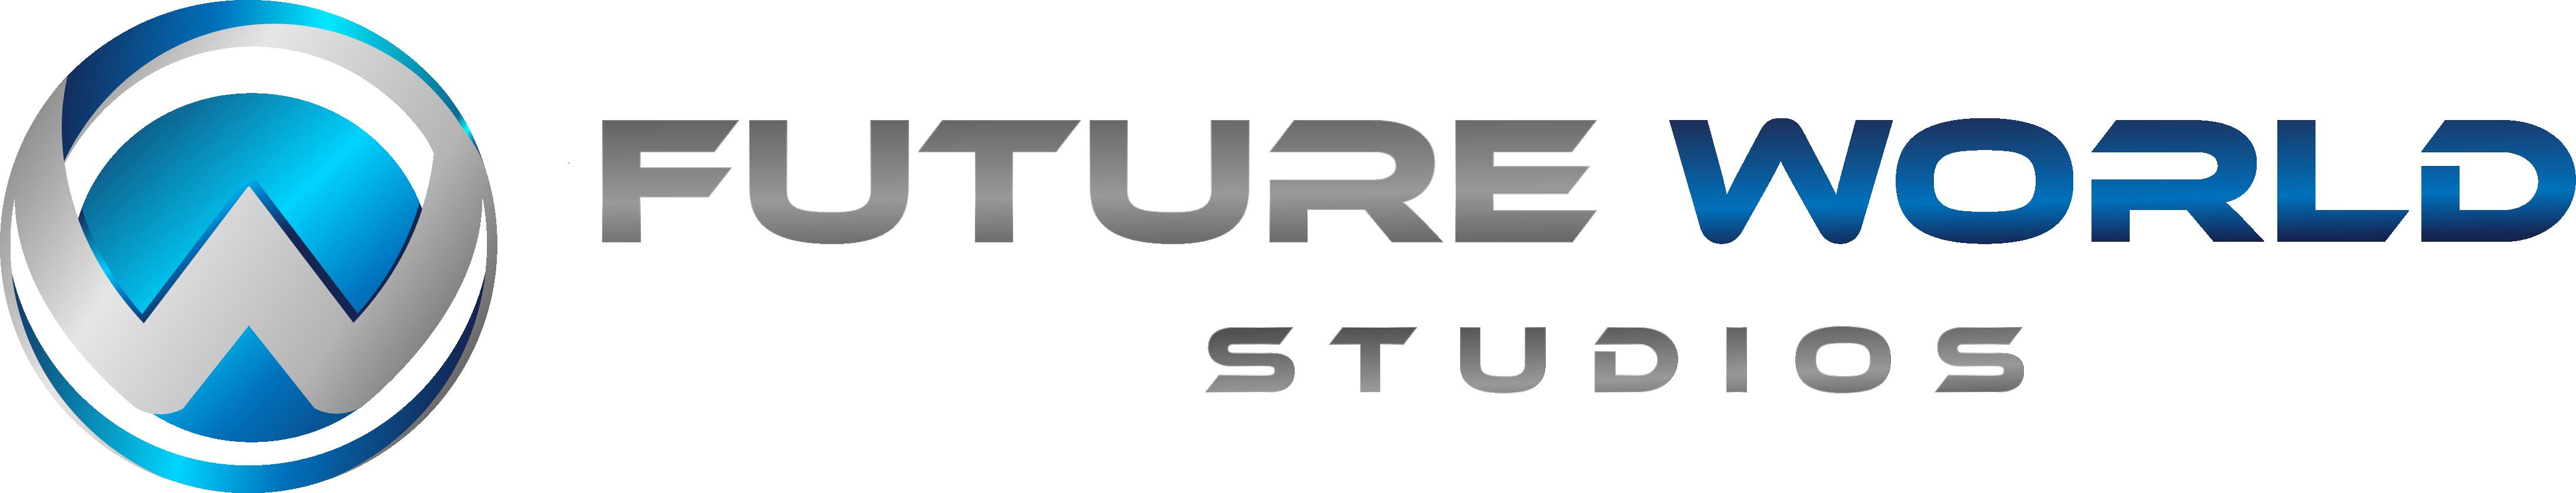 Future World Studios Logo